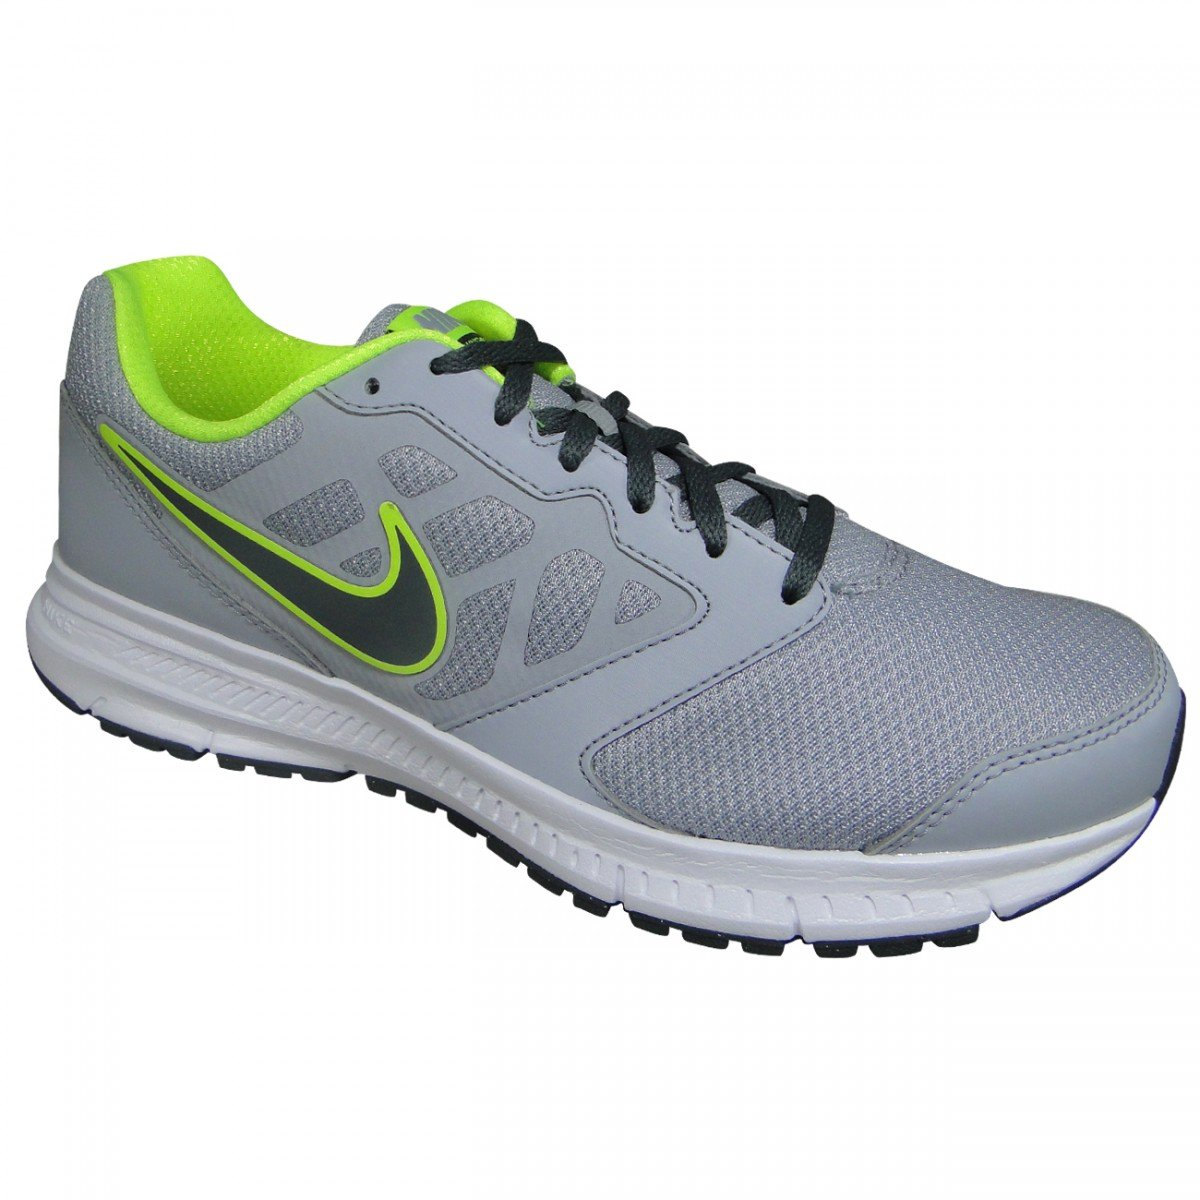 2762ac9f66 Tênis Nike Downshifter 6 - Compre Agora